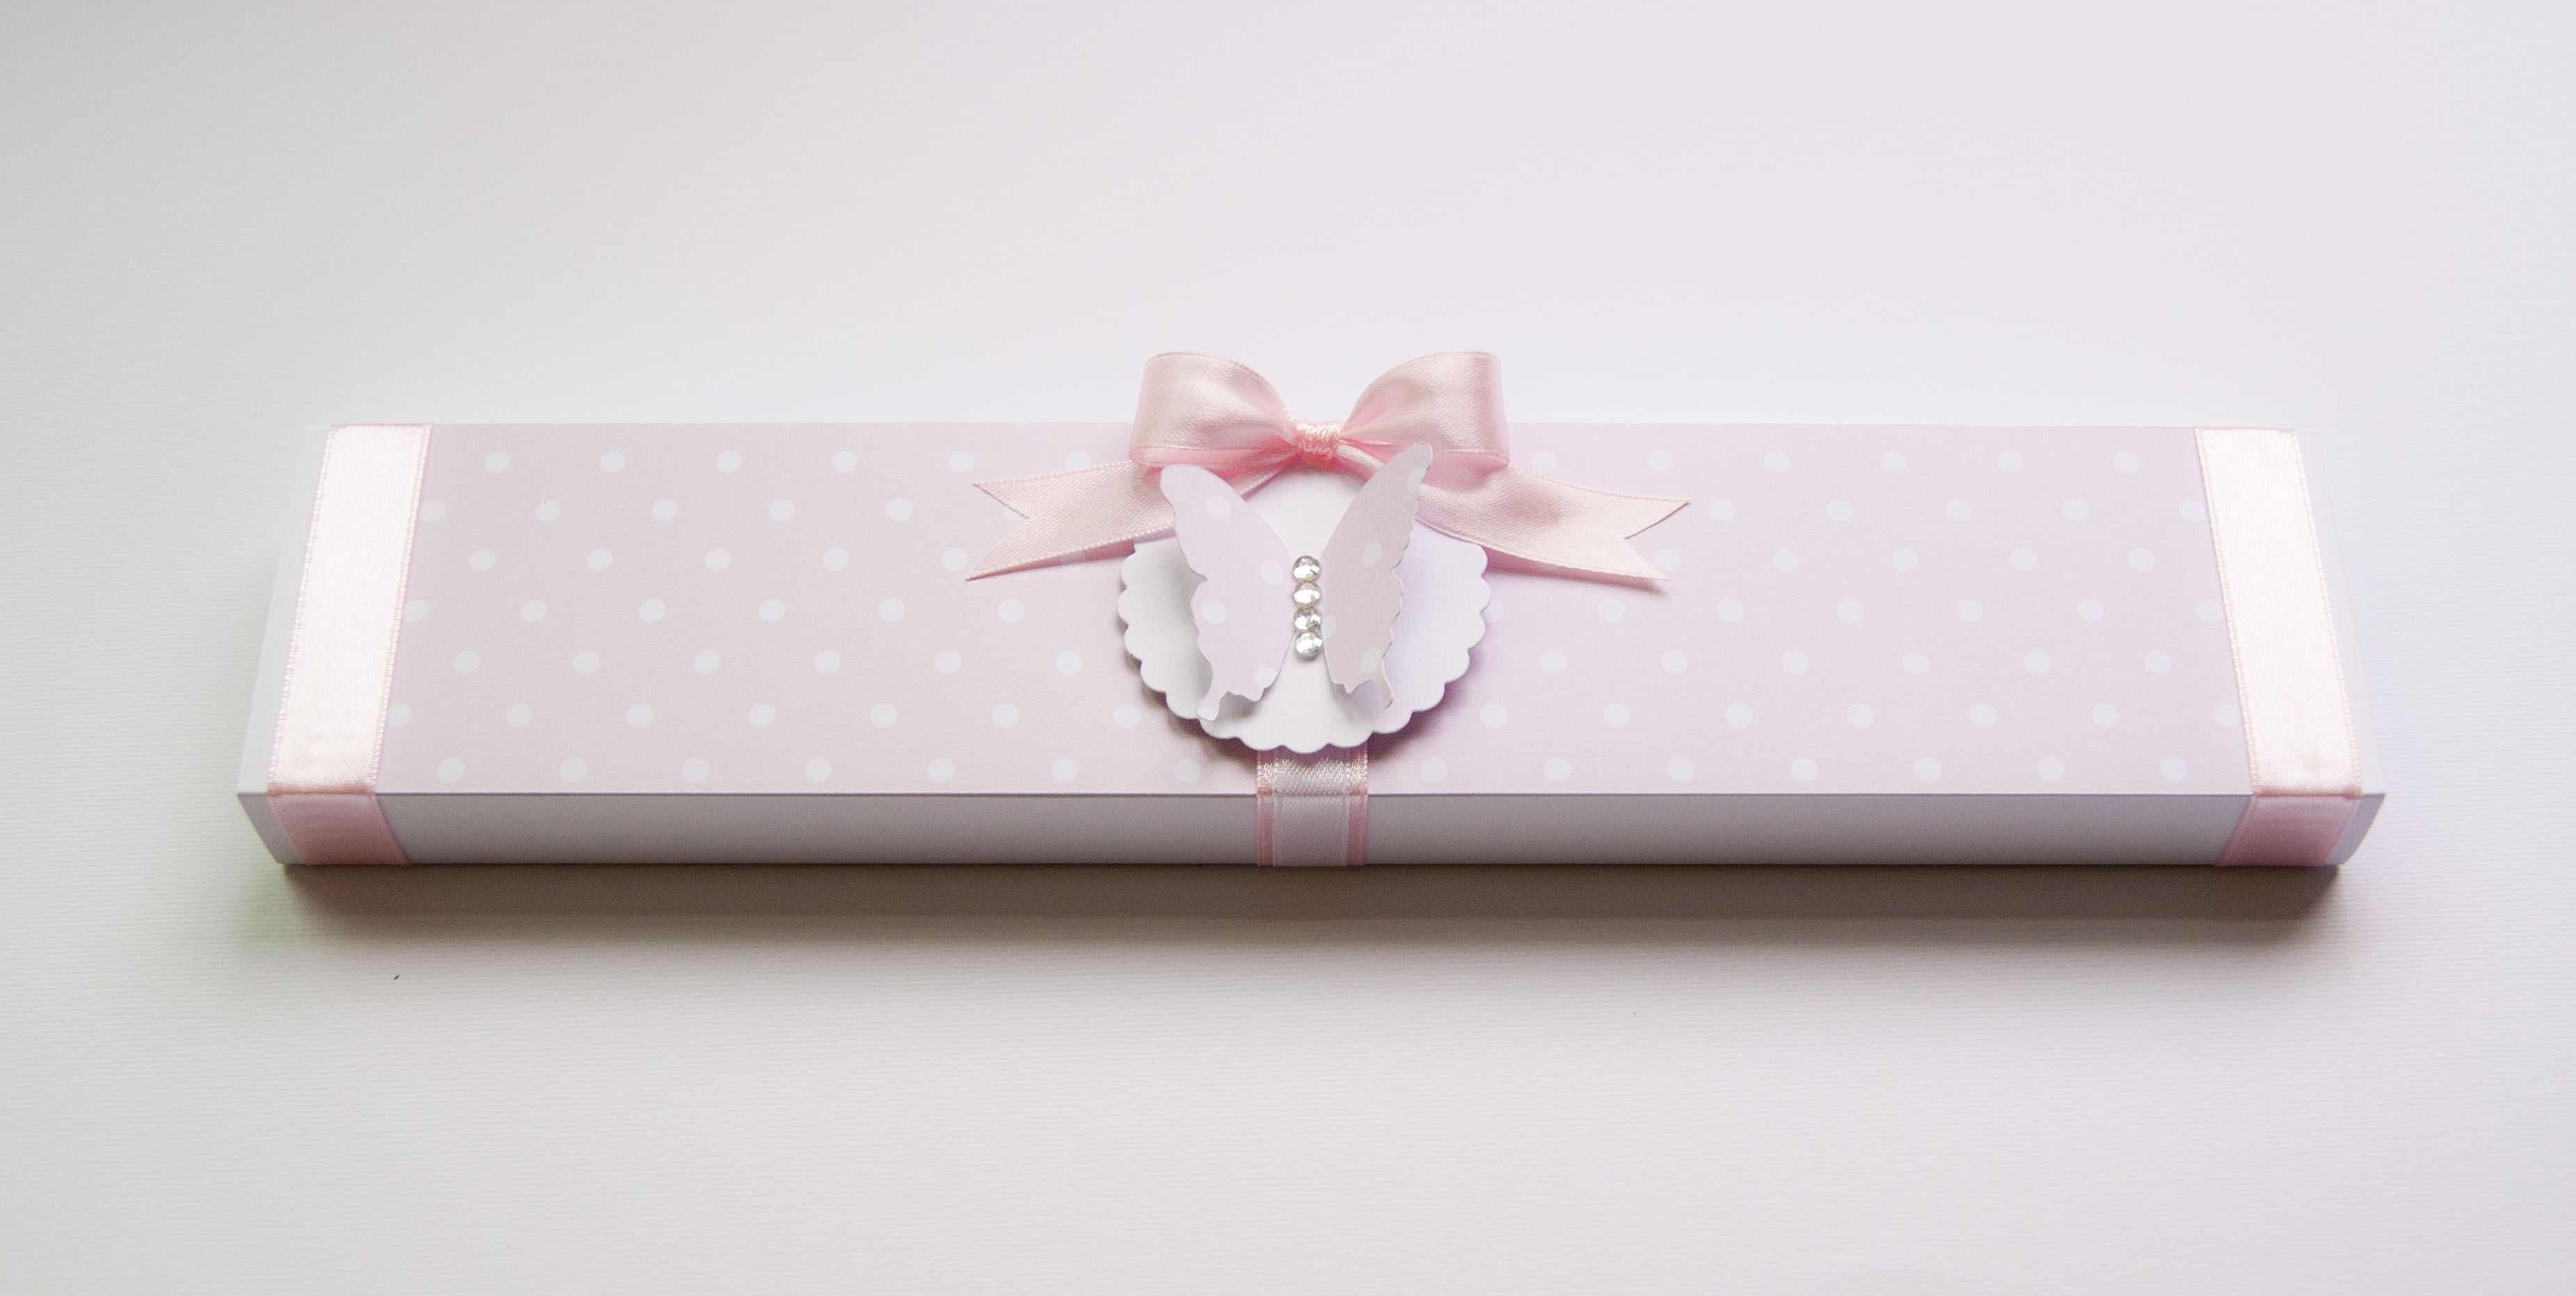 pink butterfly box https://www.facebook.com/pages/Minù-Minù-collezioni-artistiche/1441713376099936